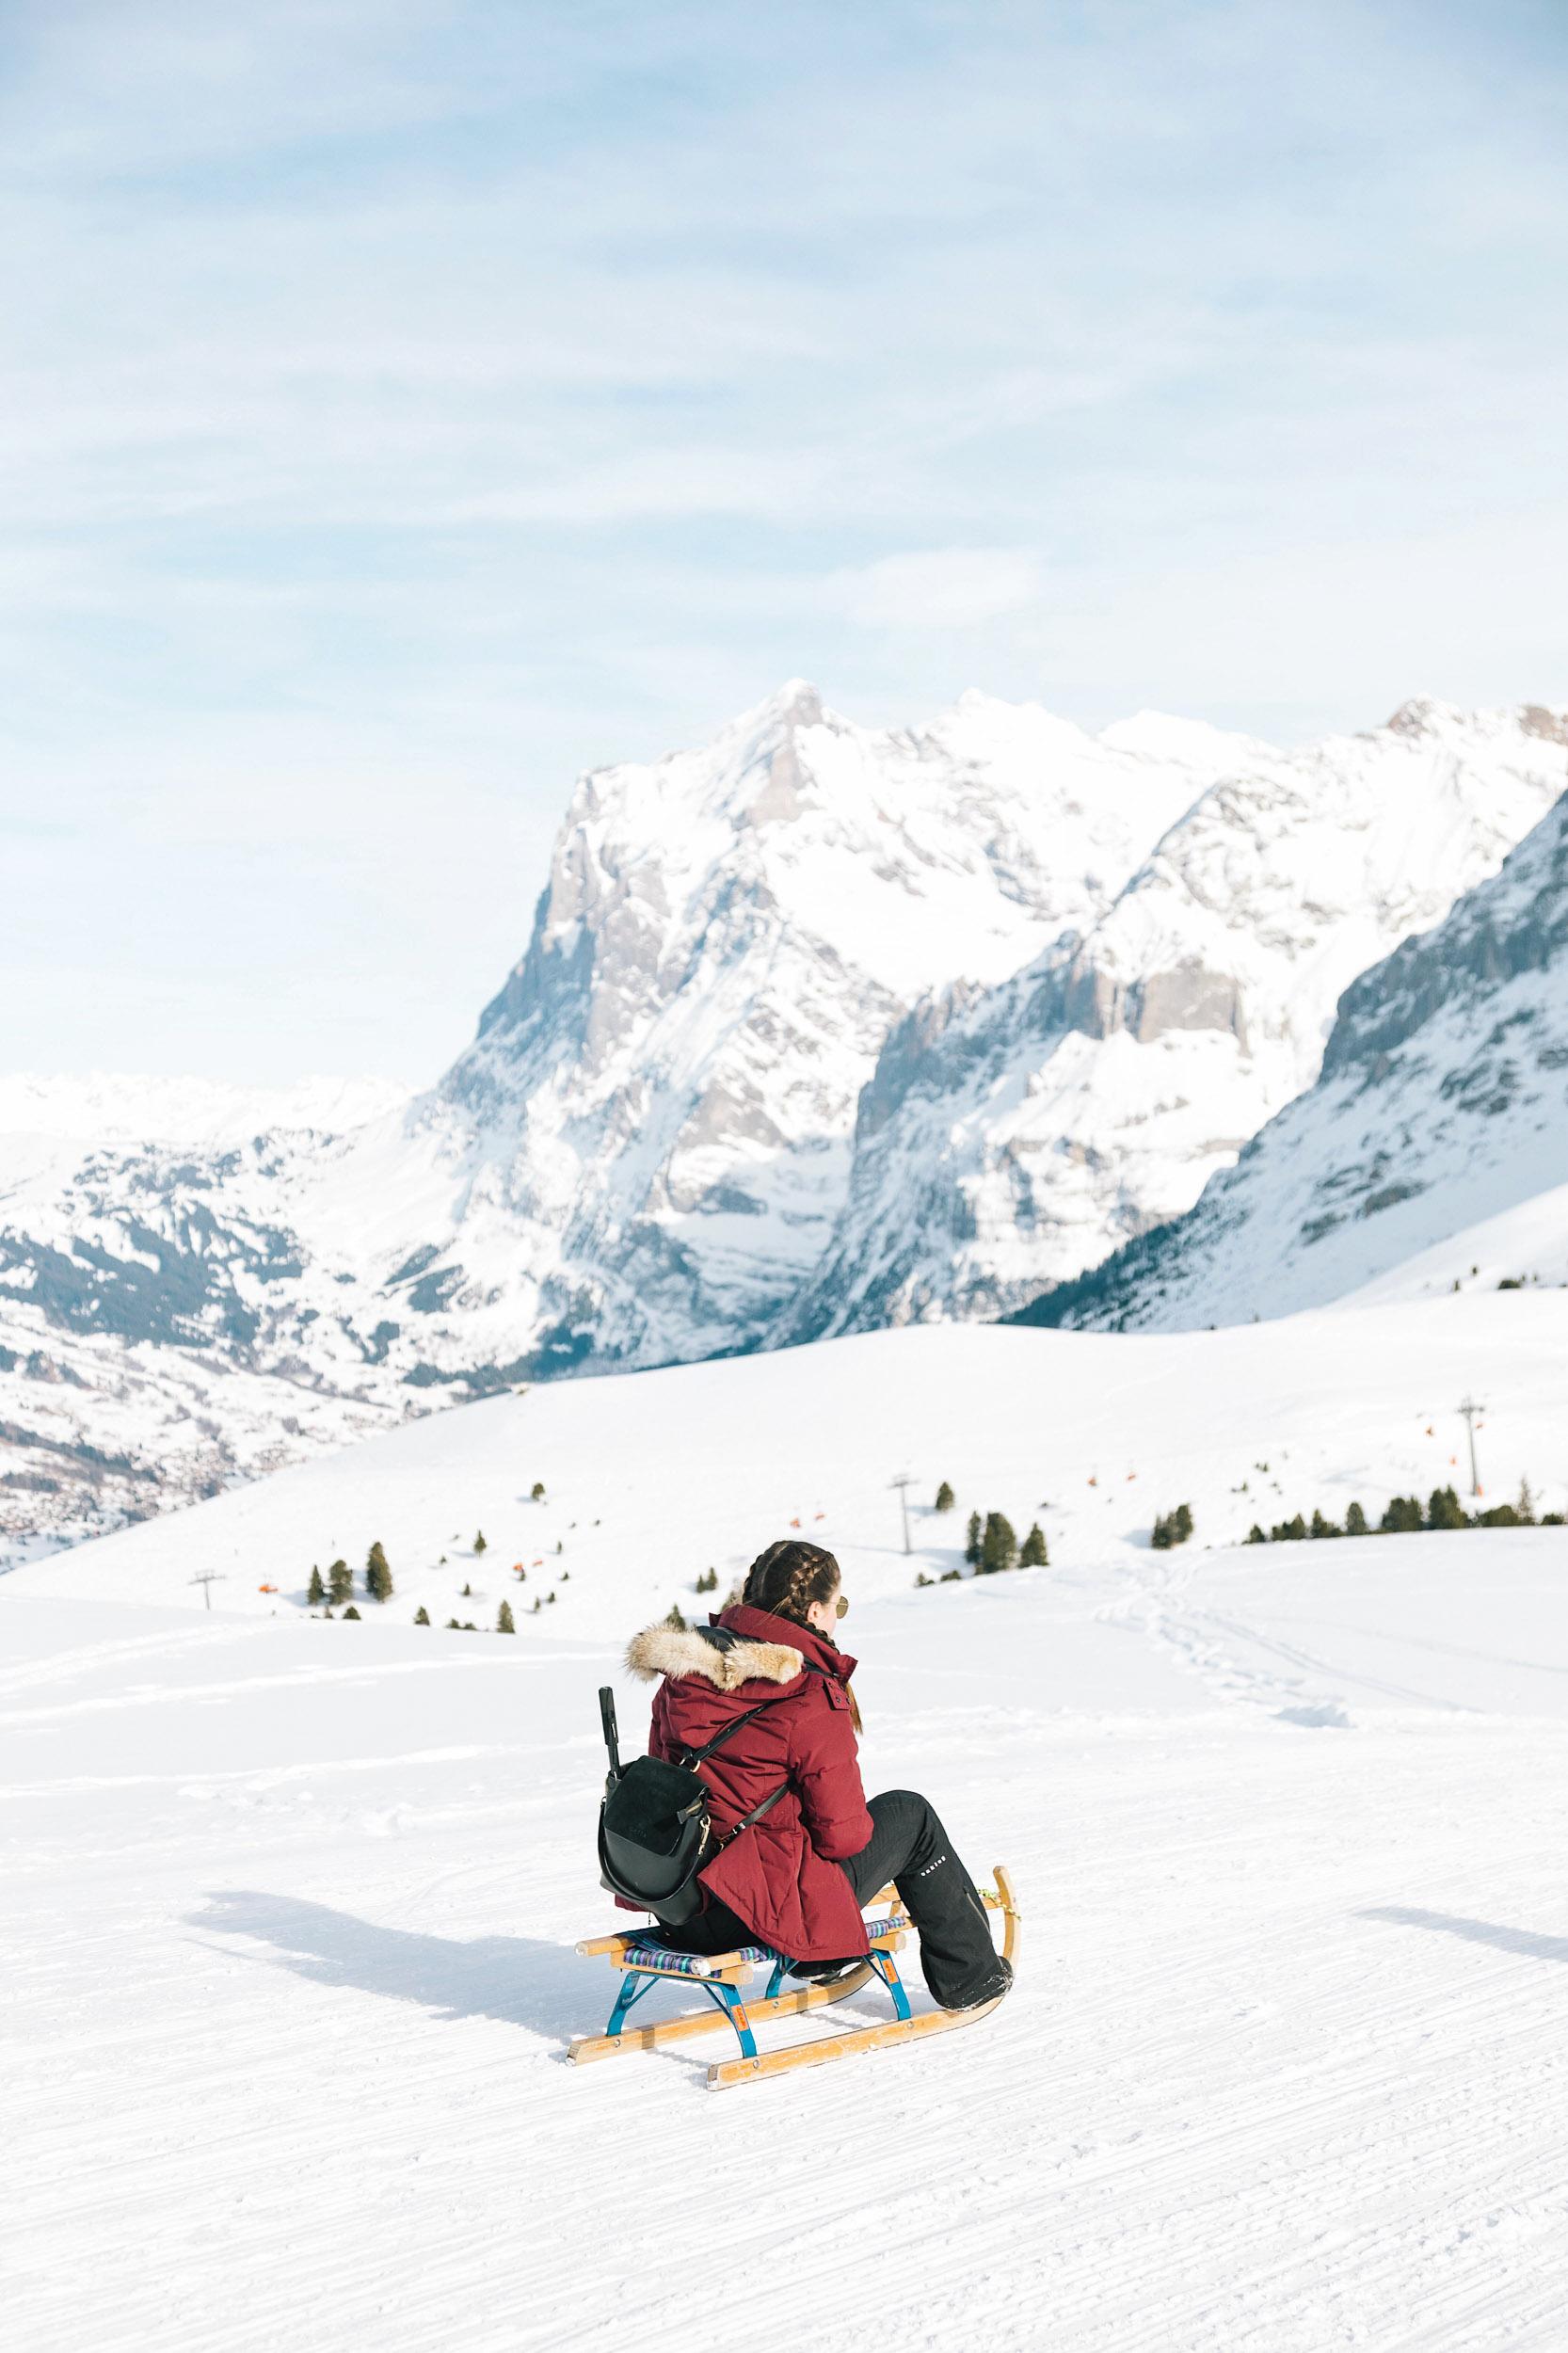 The most fun winter adventure in Switzerland - sledging!